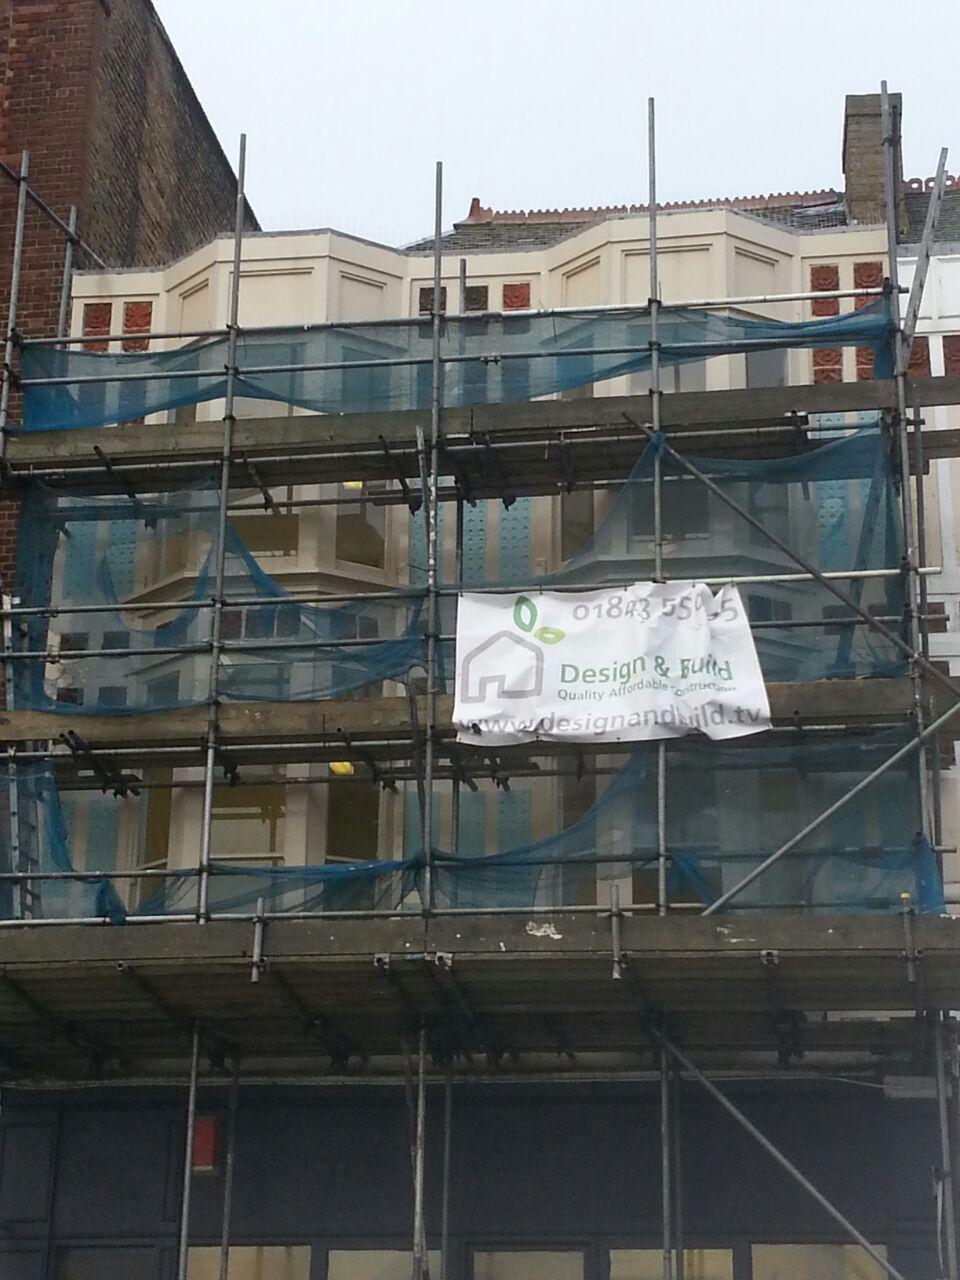 Margate-banner